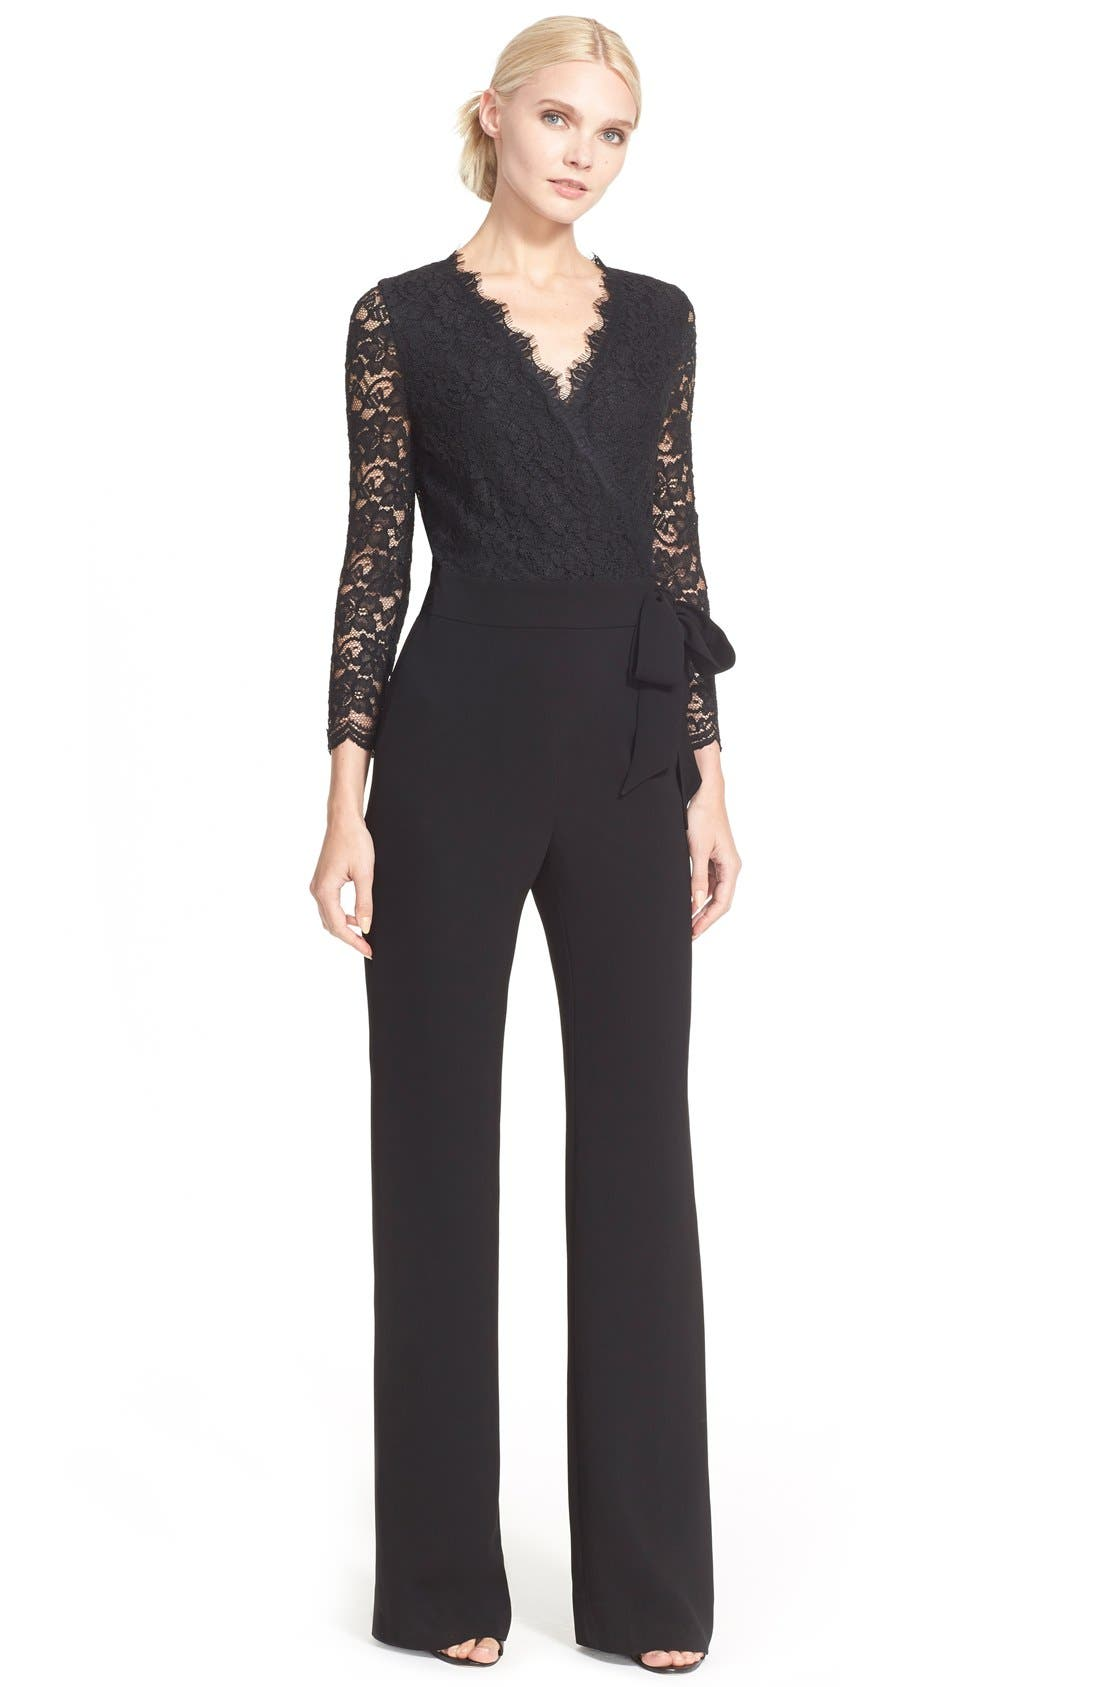 Alternate Image 1 Selected - Diane von Furstenberg 'Marlowe' Lace Jumpsuit